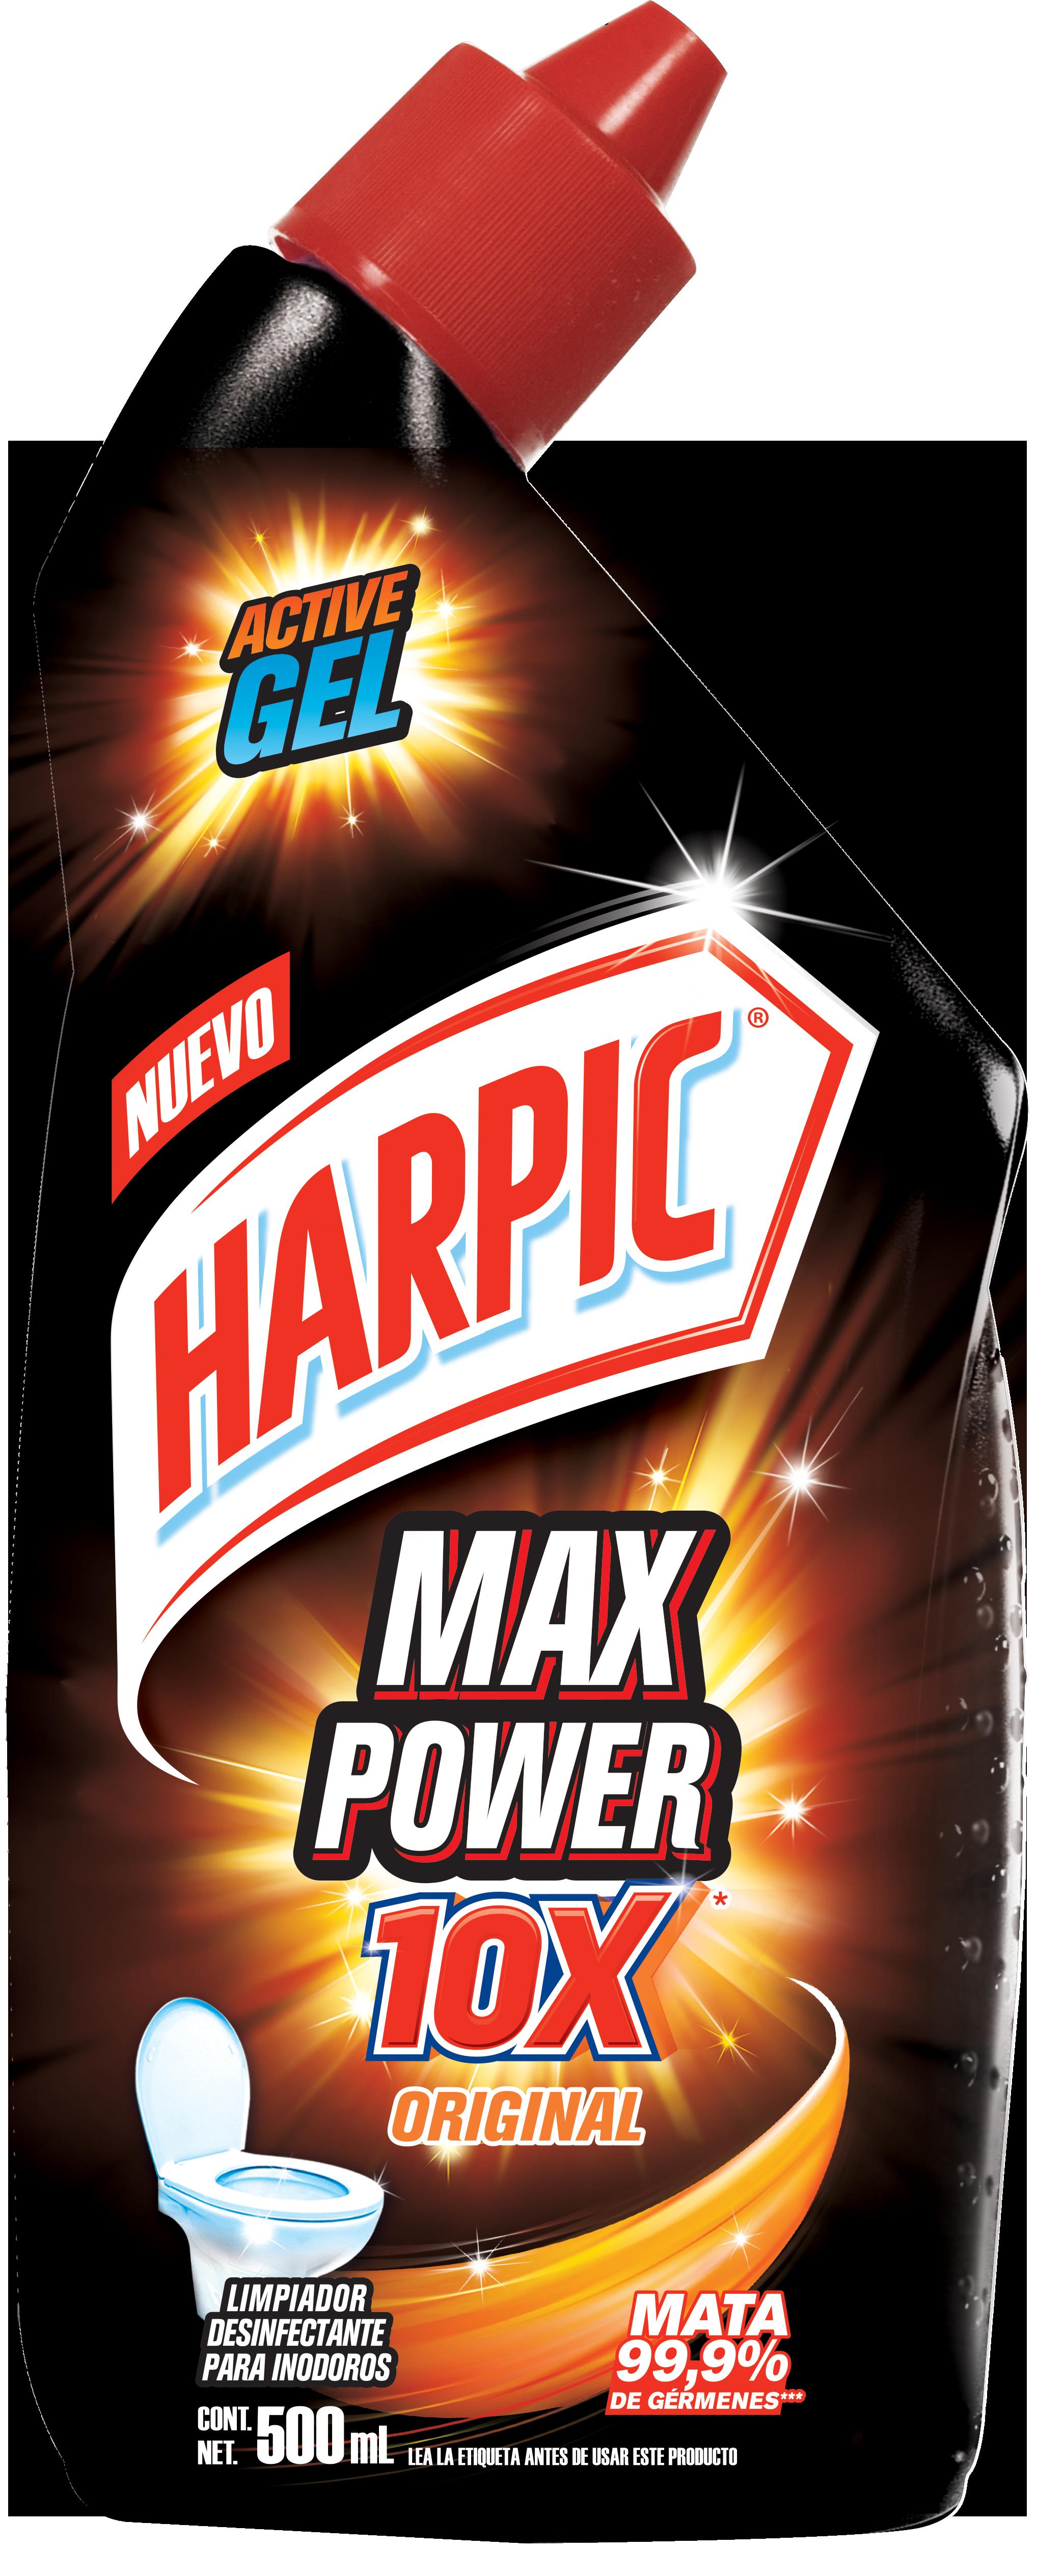 Harpic® Max Power 10x Original 500ml